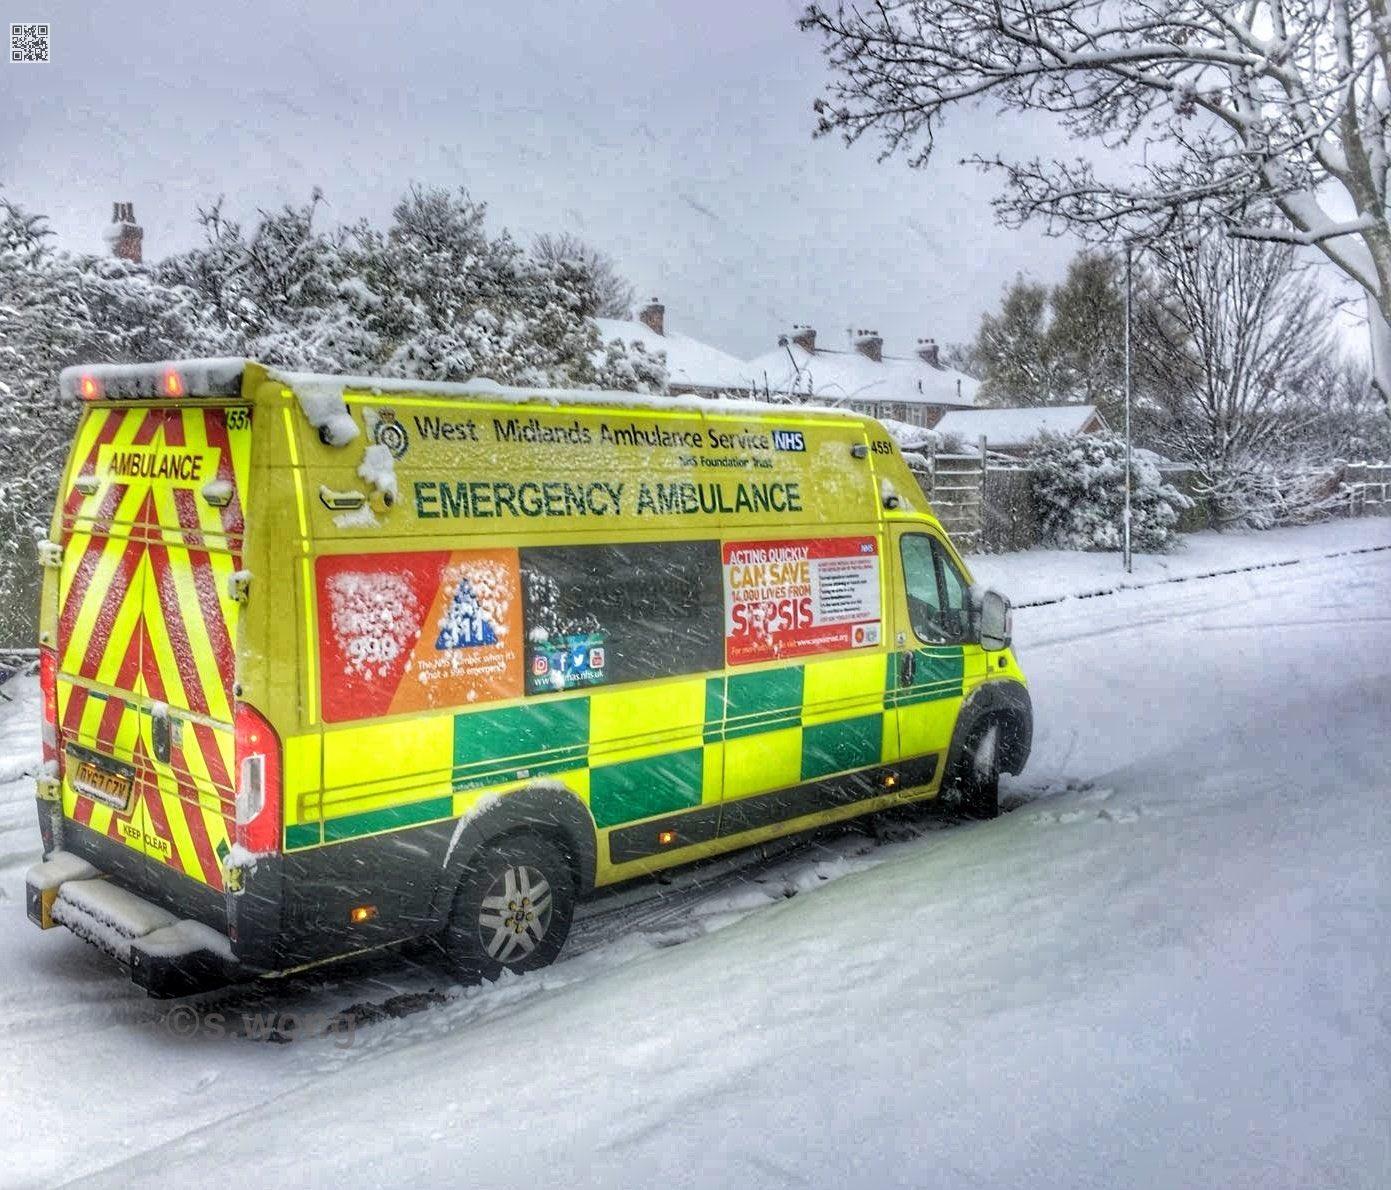 wm ambulance snow